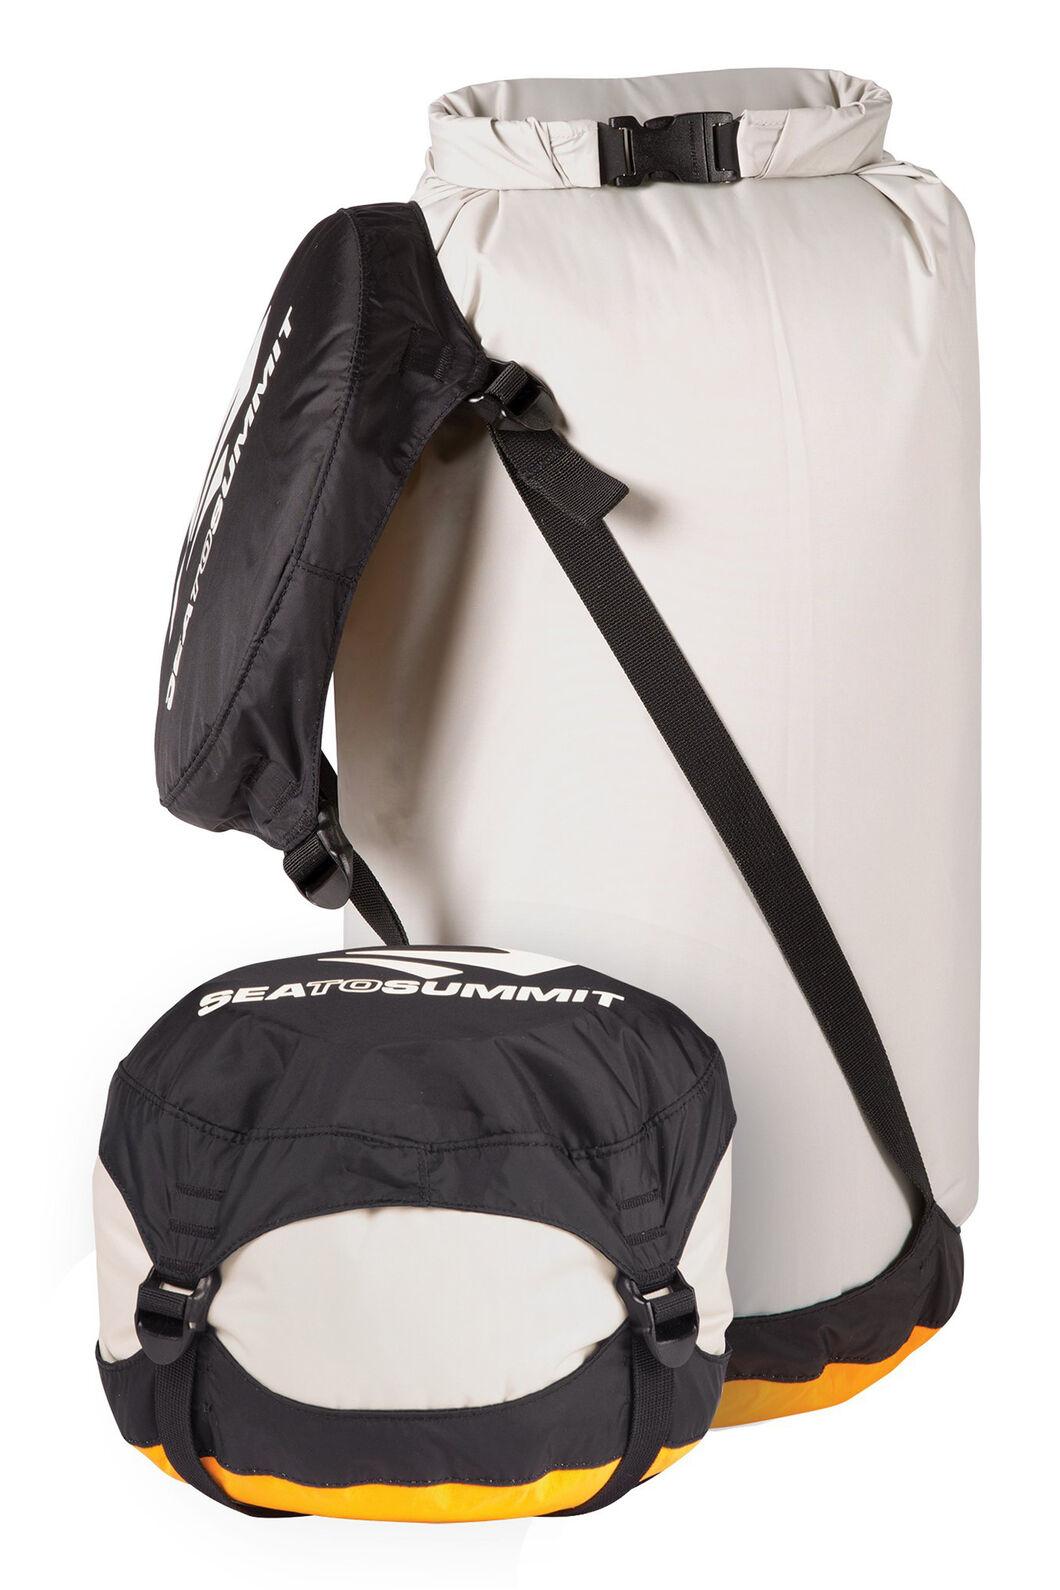 Sea to Summit Medium Compression Sack Dry Bag, None, hi-res